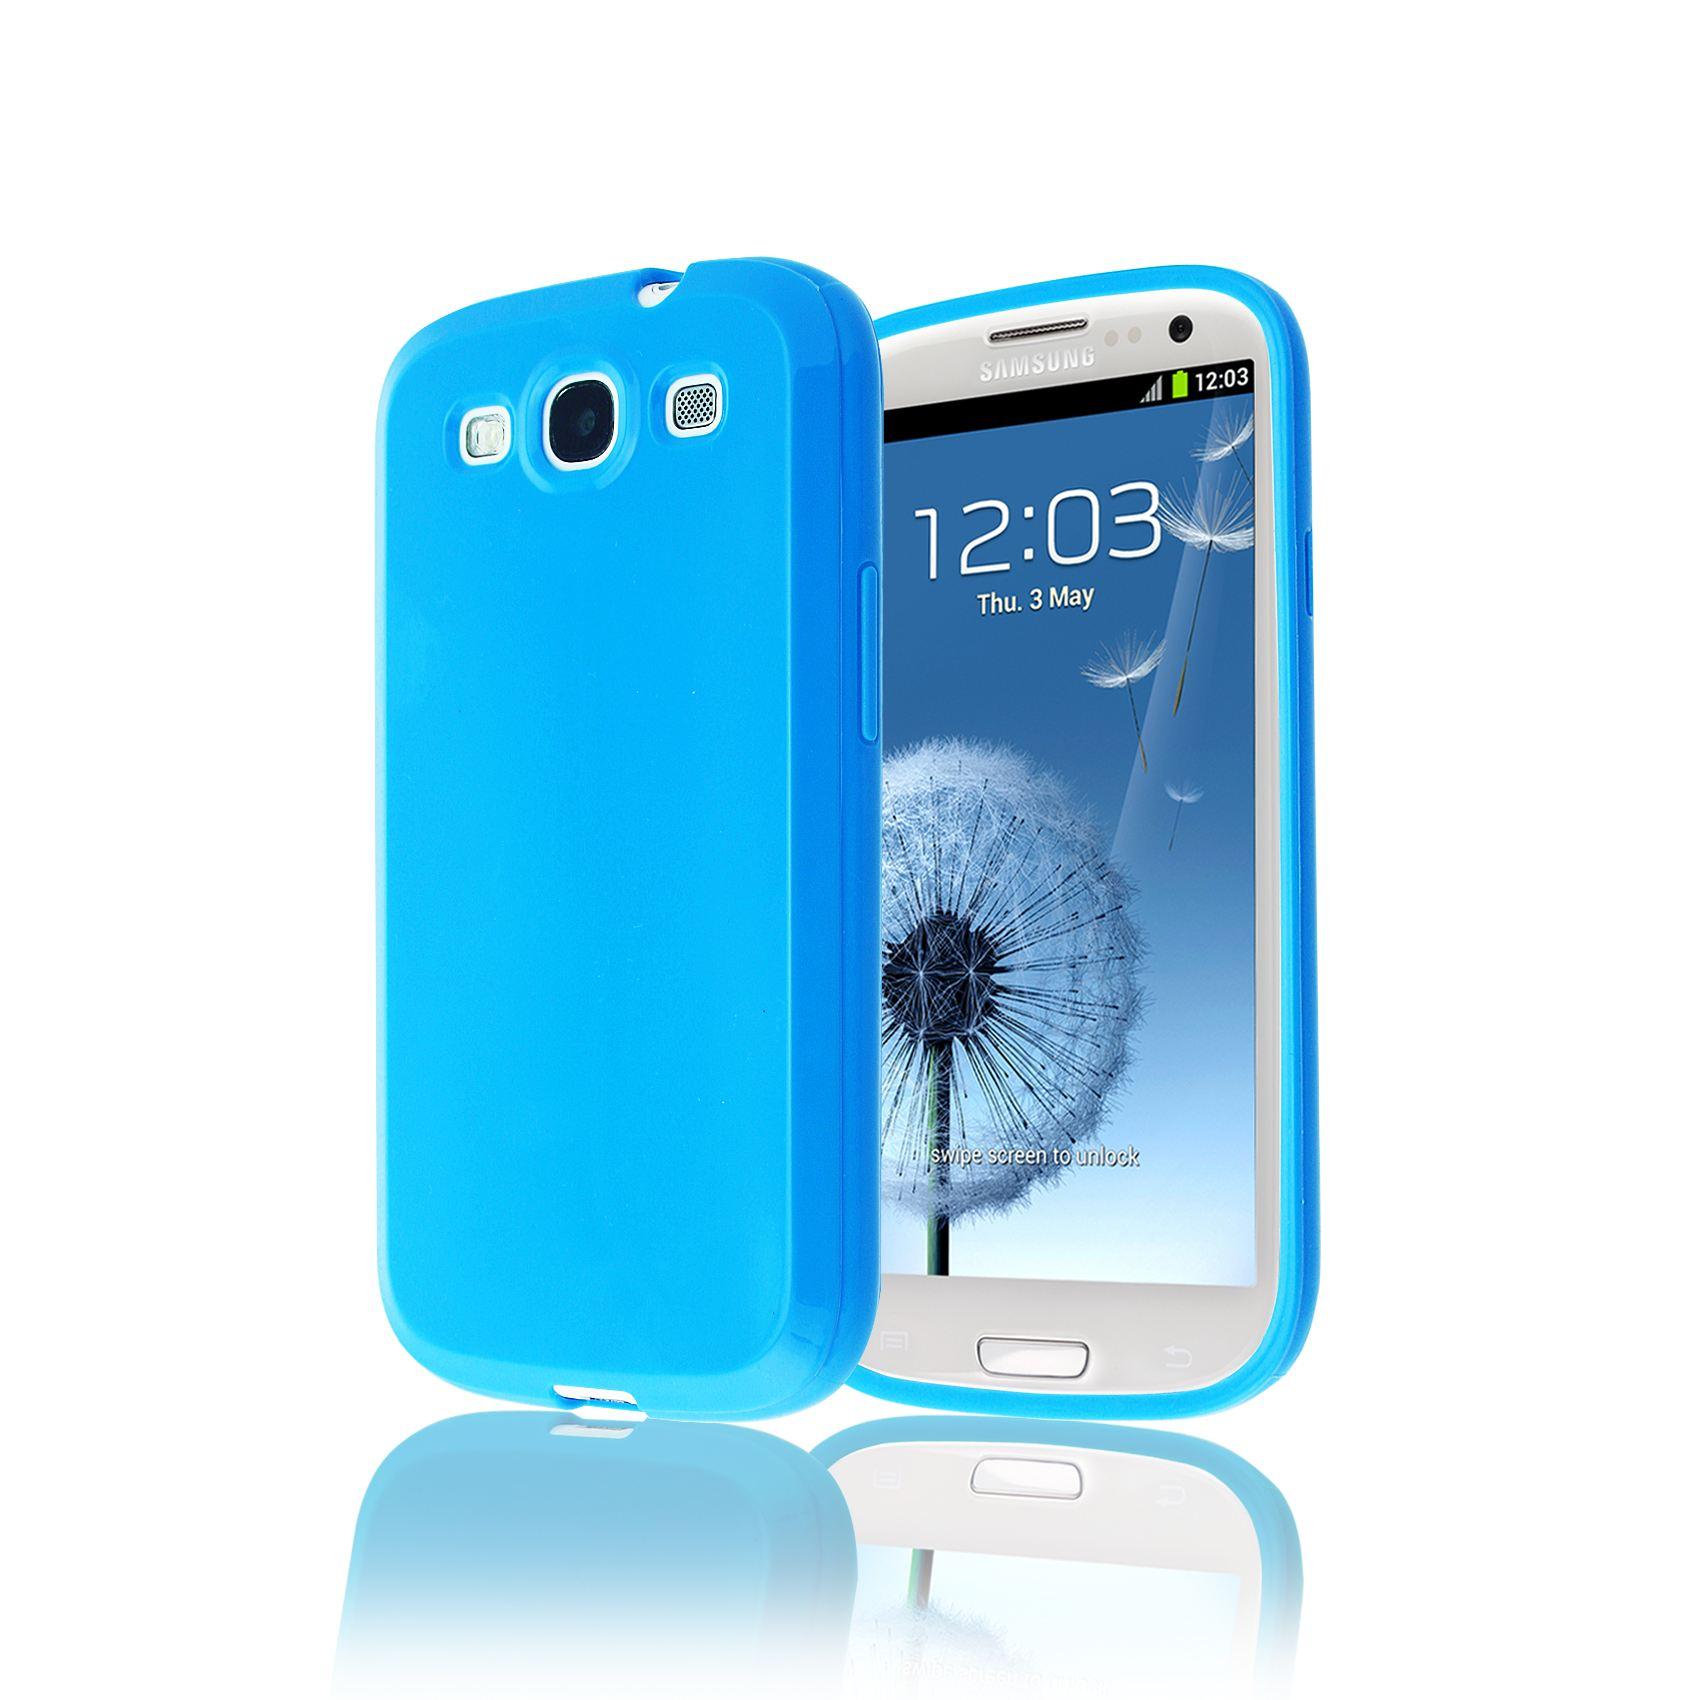 1e2013bec Silikonové pouzdro / obal na Samsung Galaxy S3 / S3 Neo (SGS3UK2)